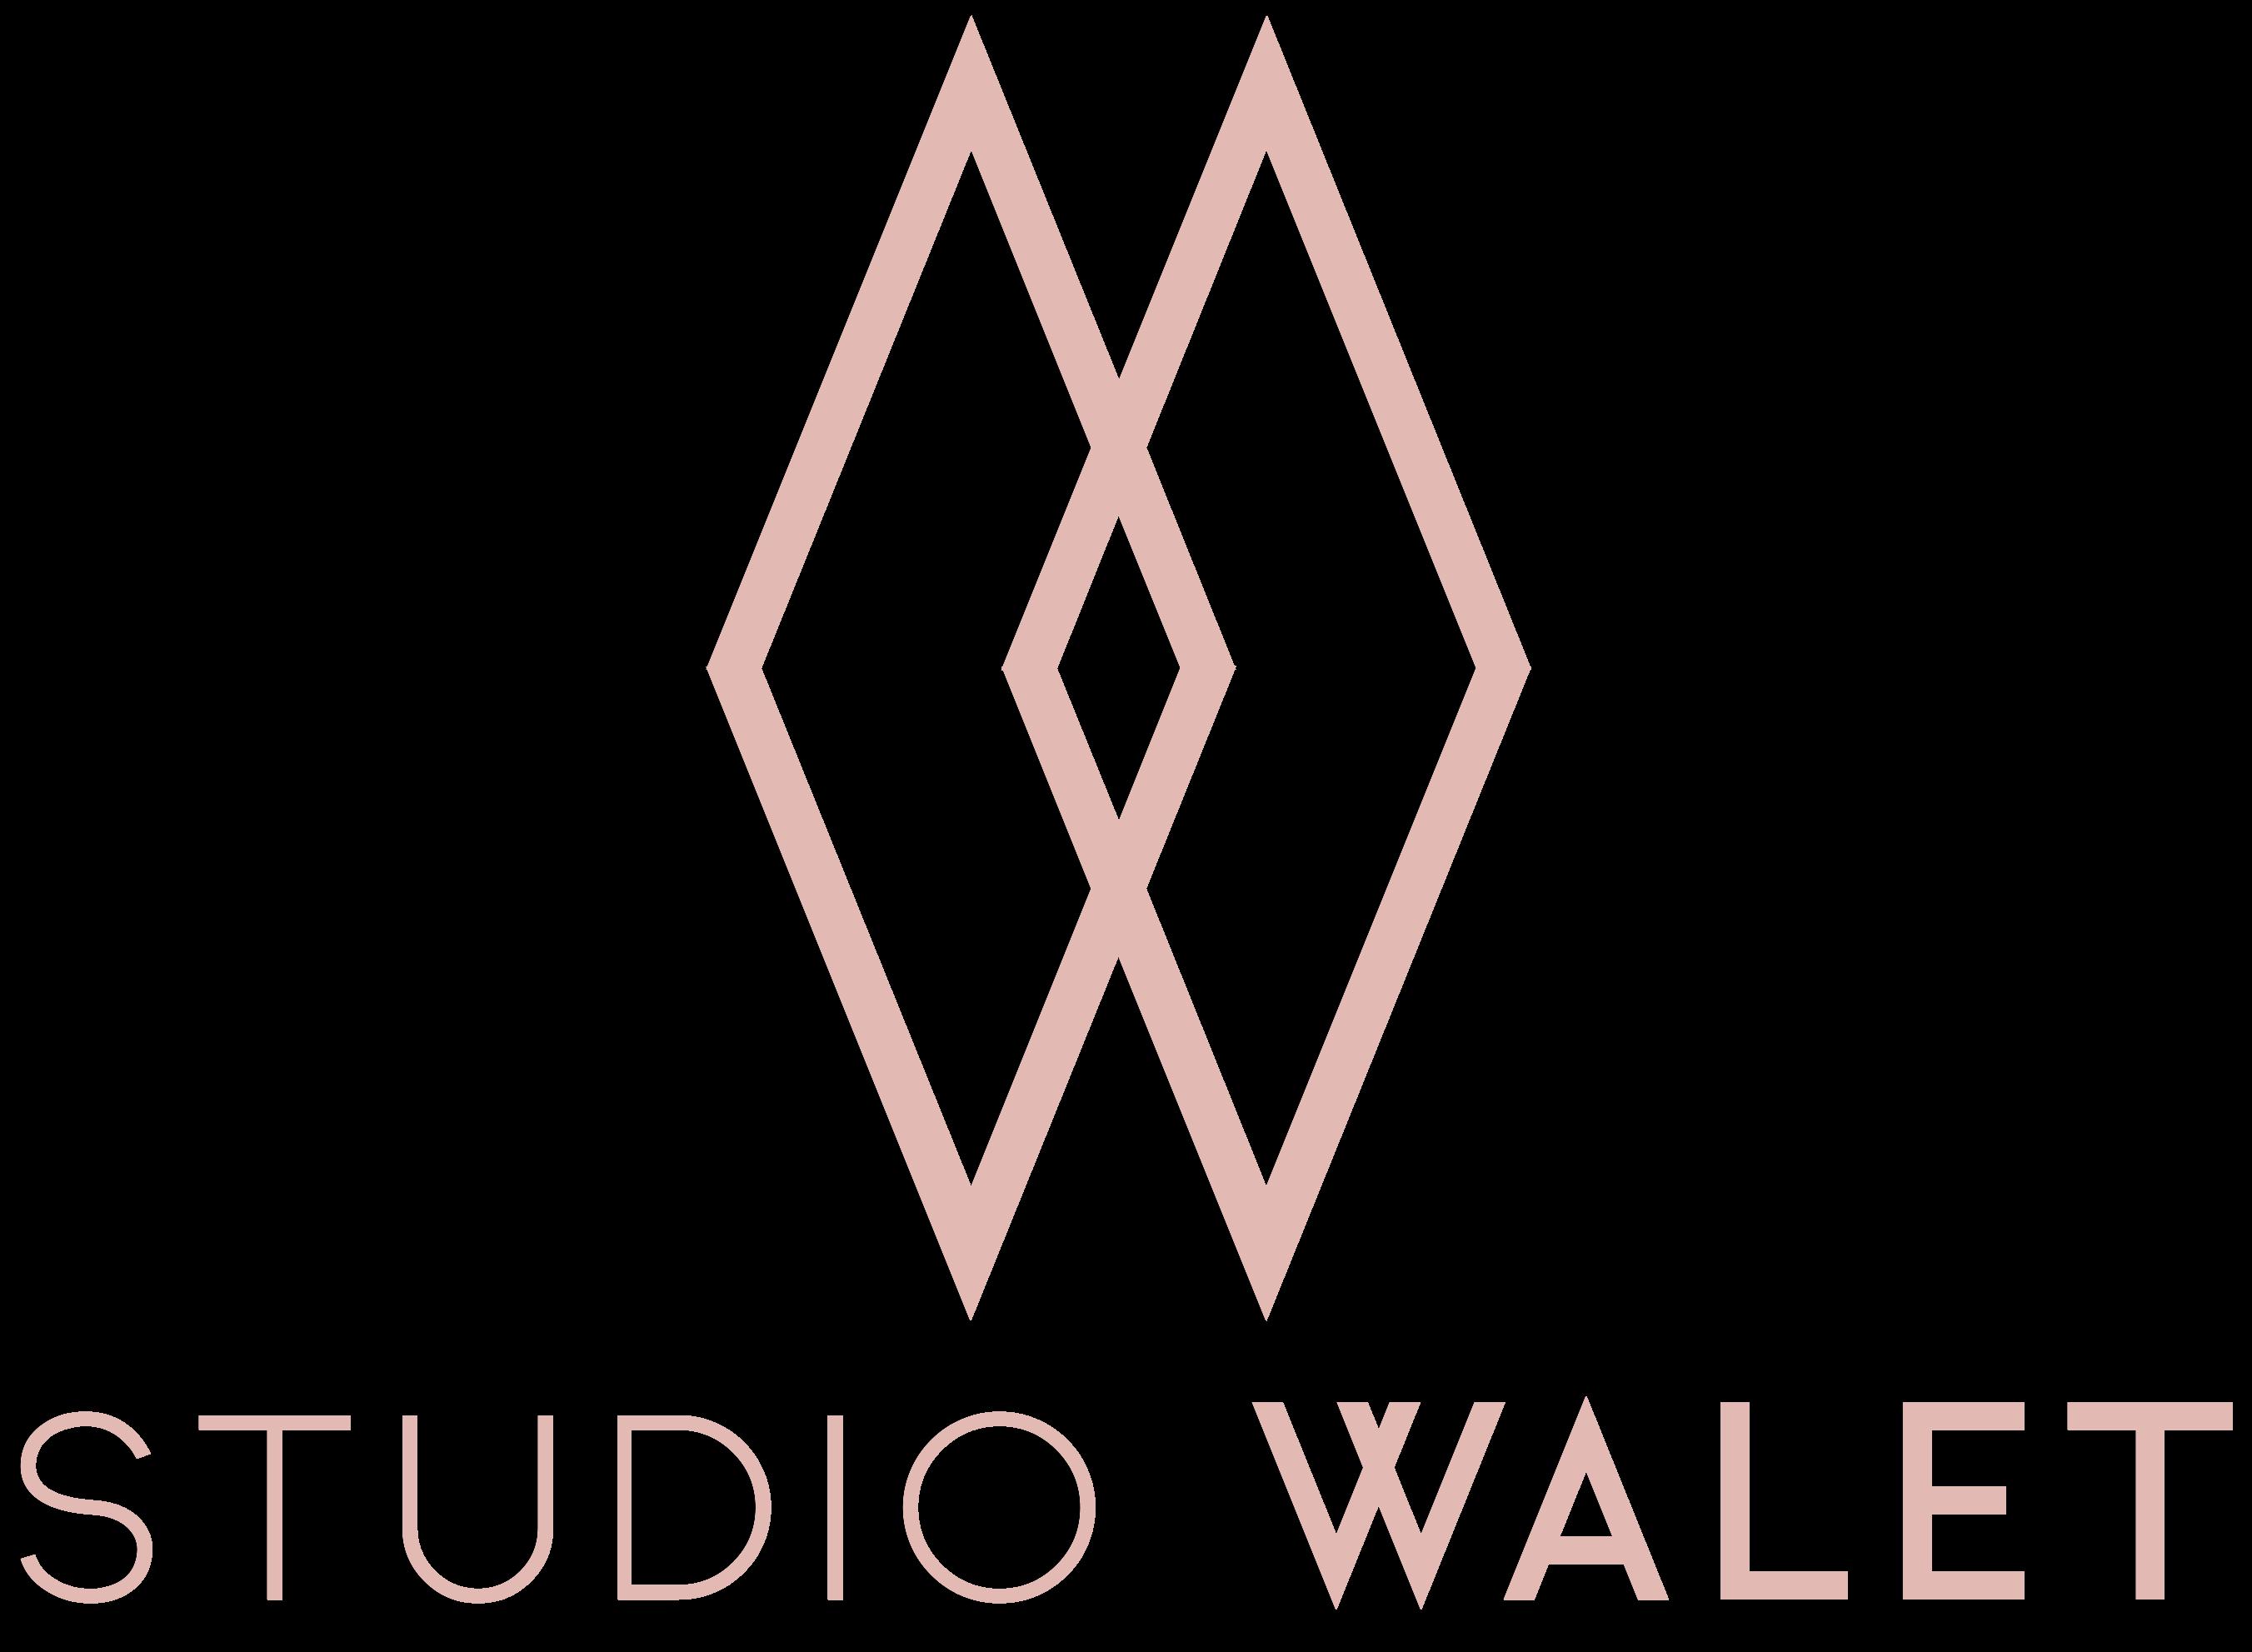 Studio Walet